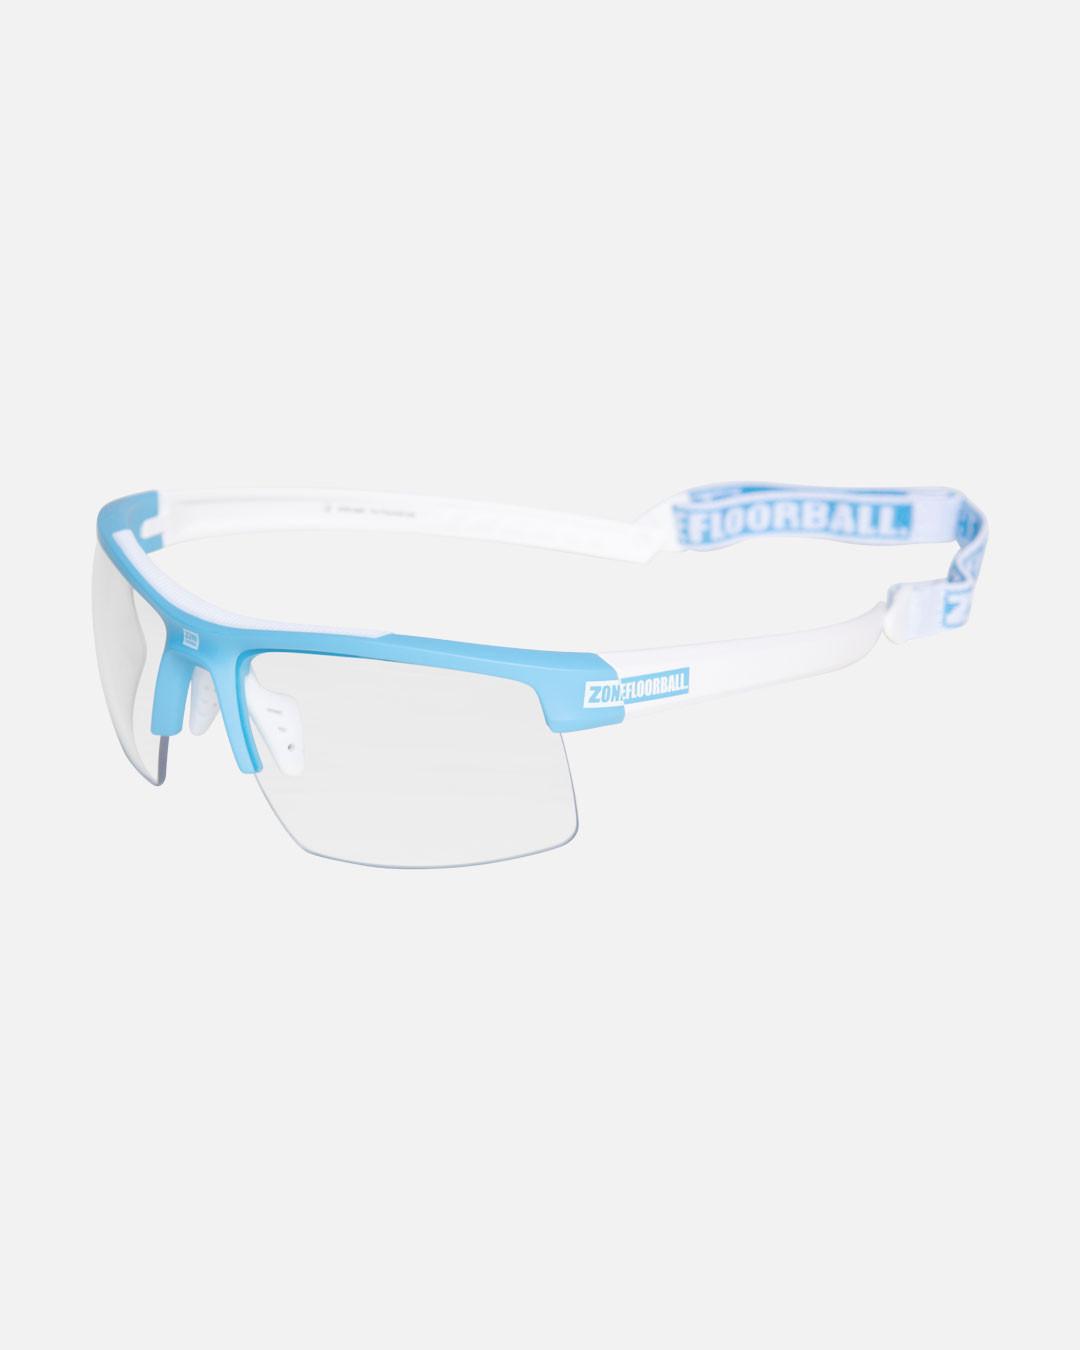 PROTECTOR SPORT GLASSES JUNIOR BLUE/WHITE